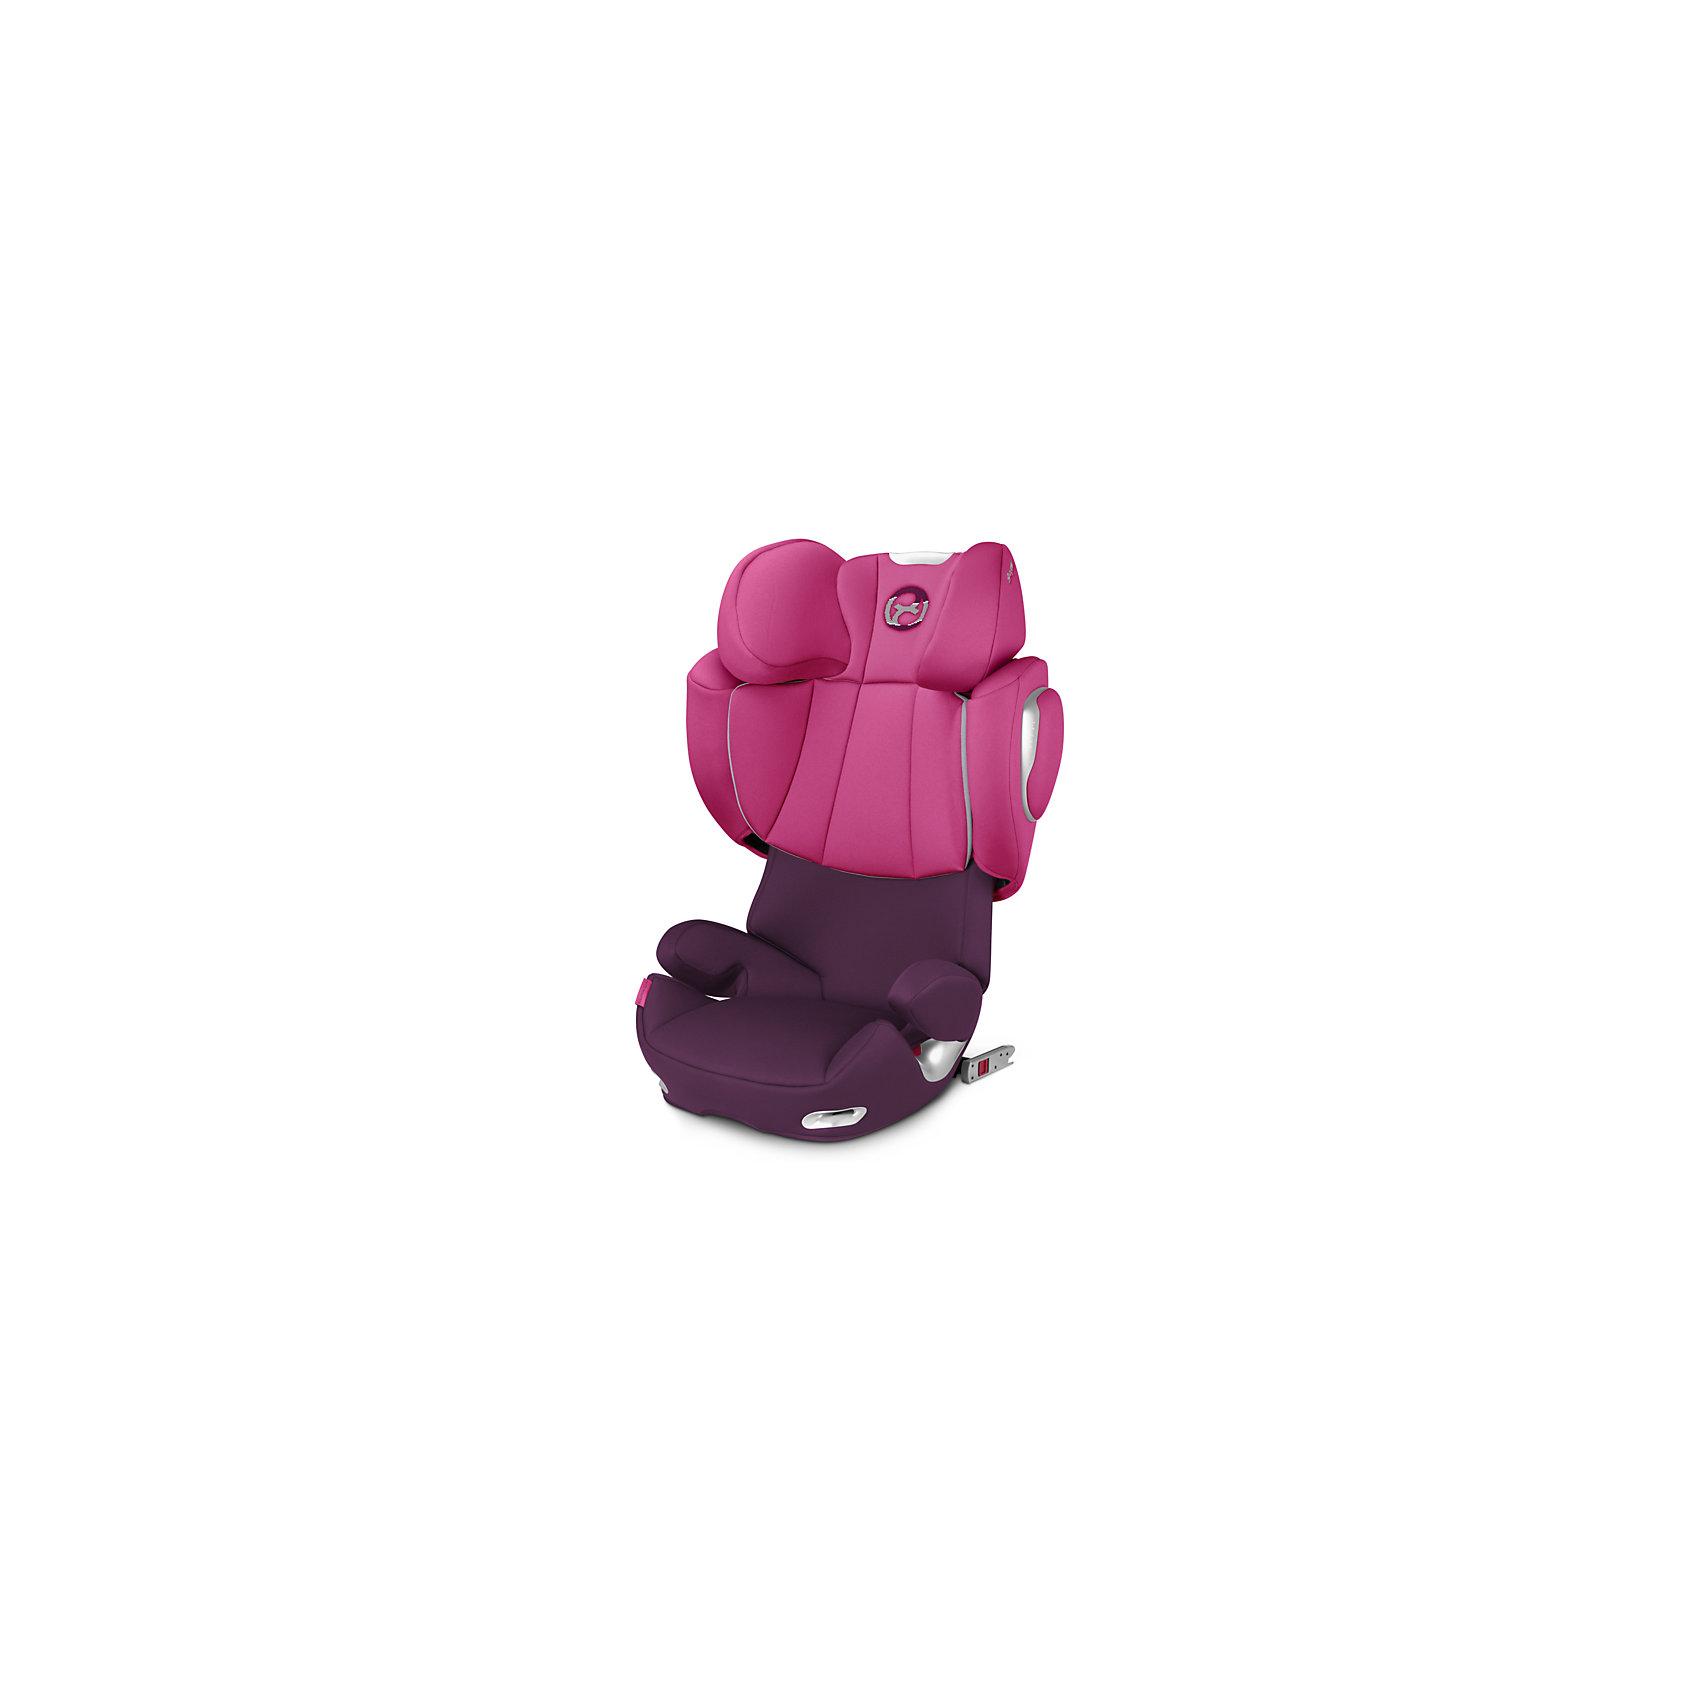 Автокресло Cybex Solution Q3-fix, 15-36 кг, Mystic Pink